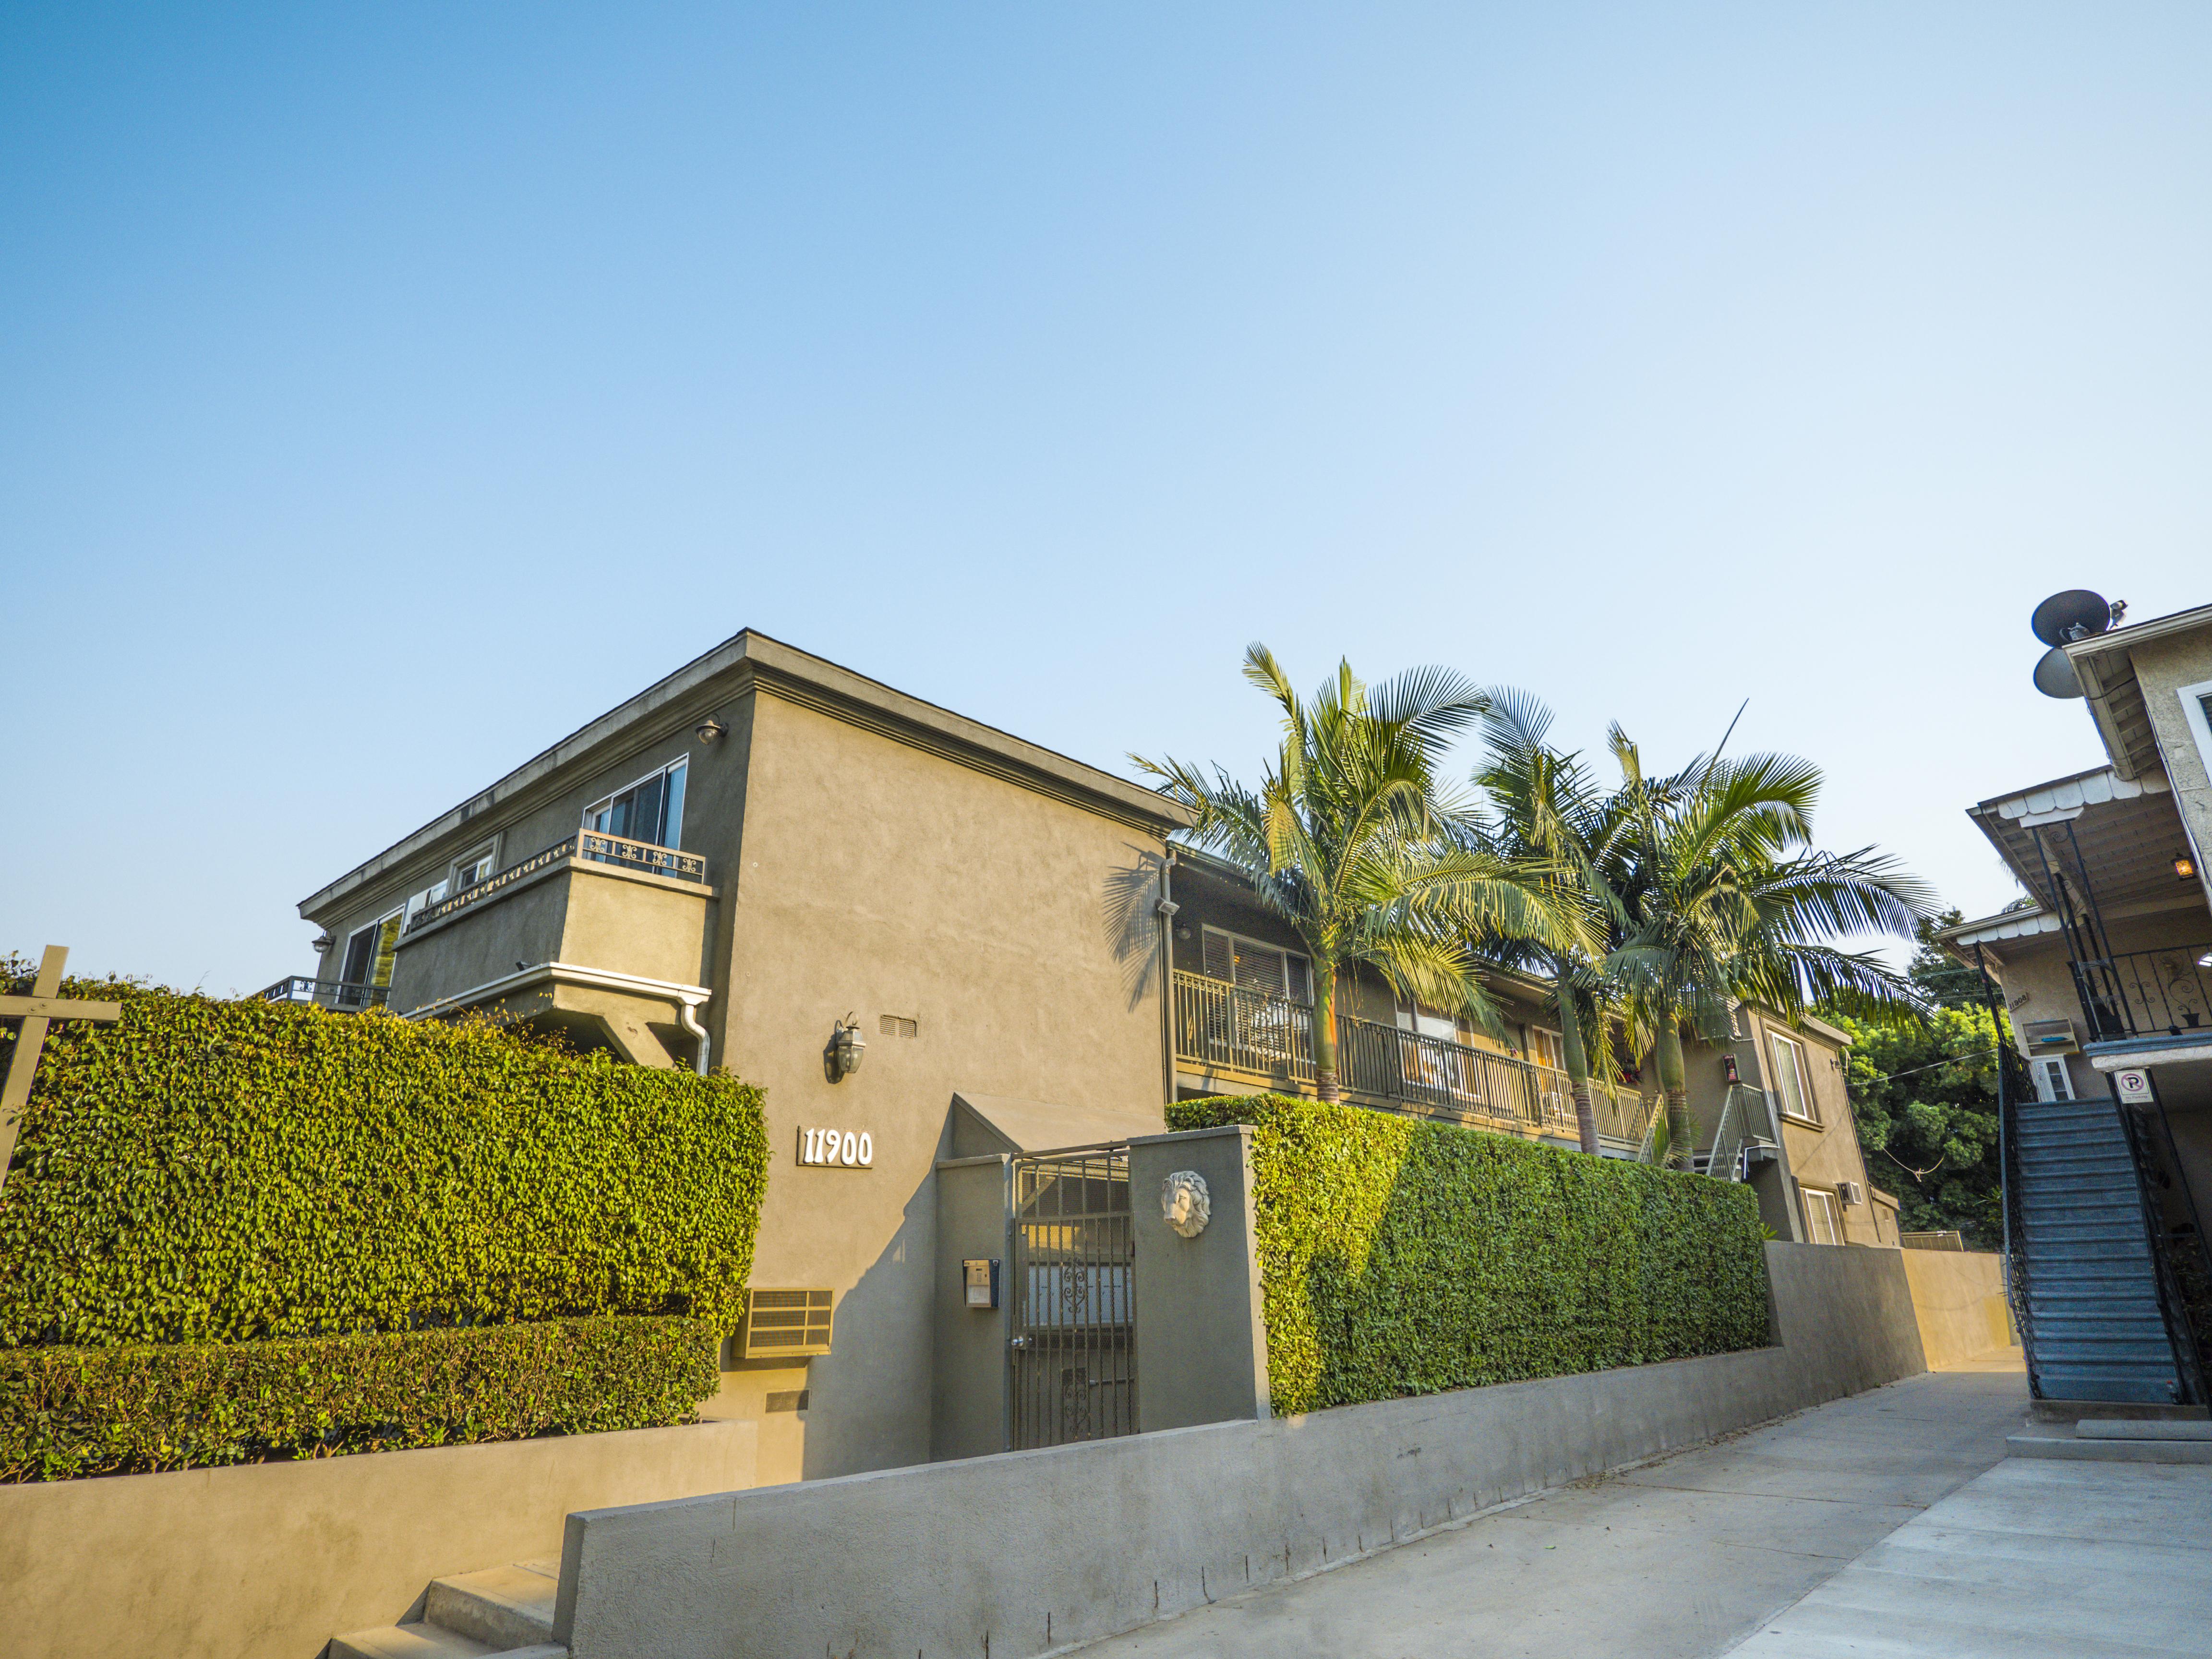 11900 Venice Blvd., Los Angeles, CA 90066